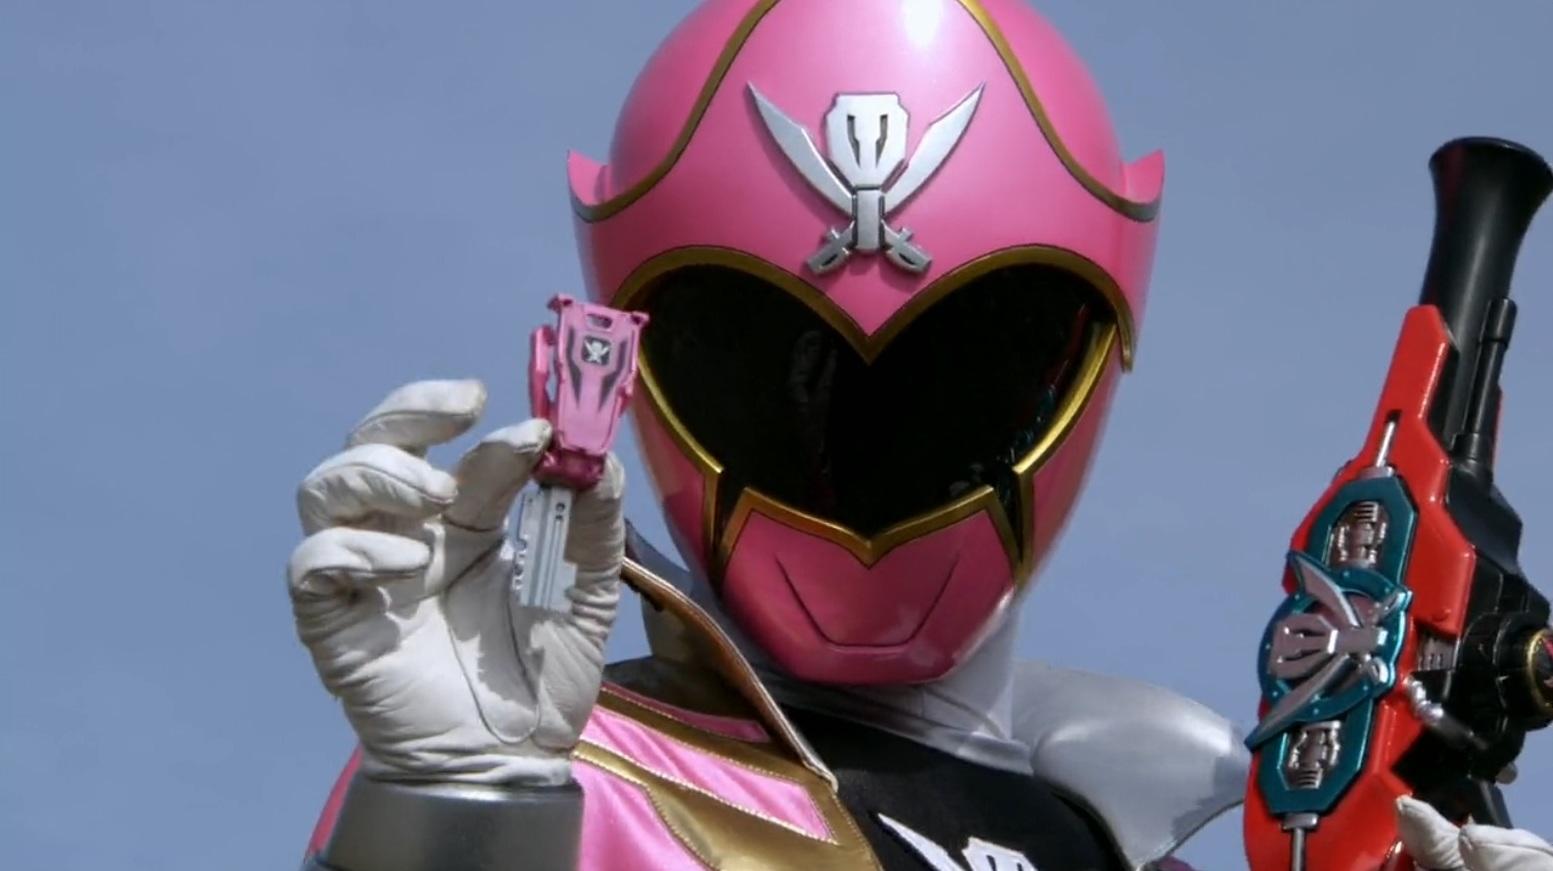 Super Sentai Images: Ranger Profile: Gokaiger GokaiPink